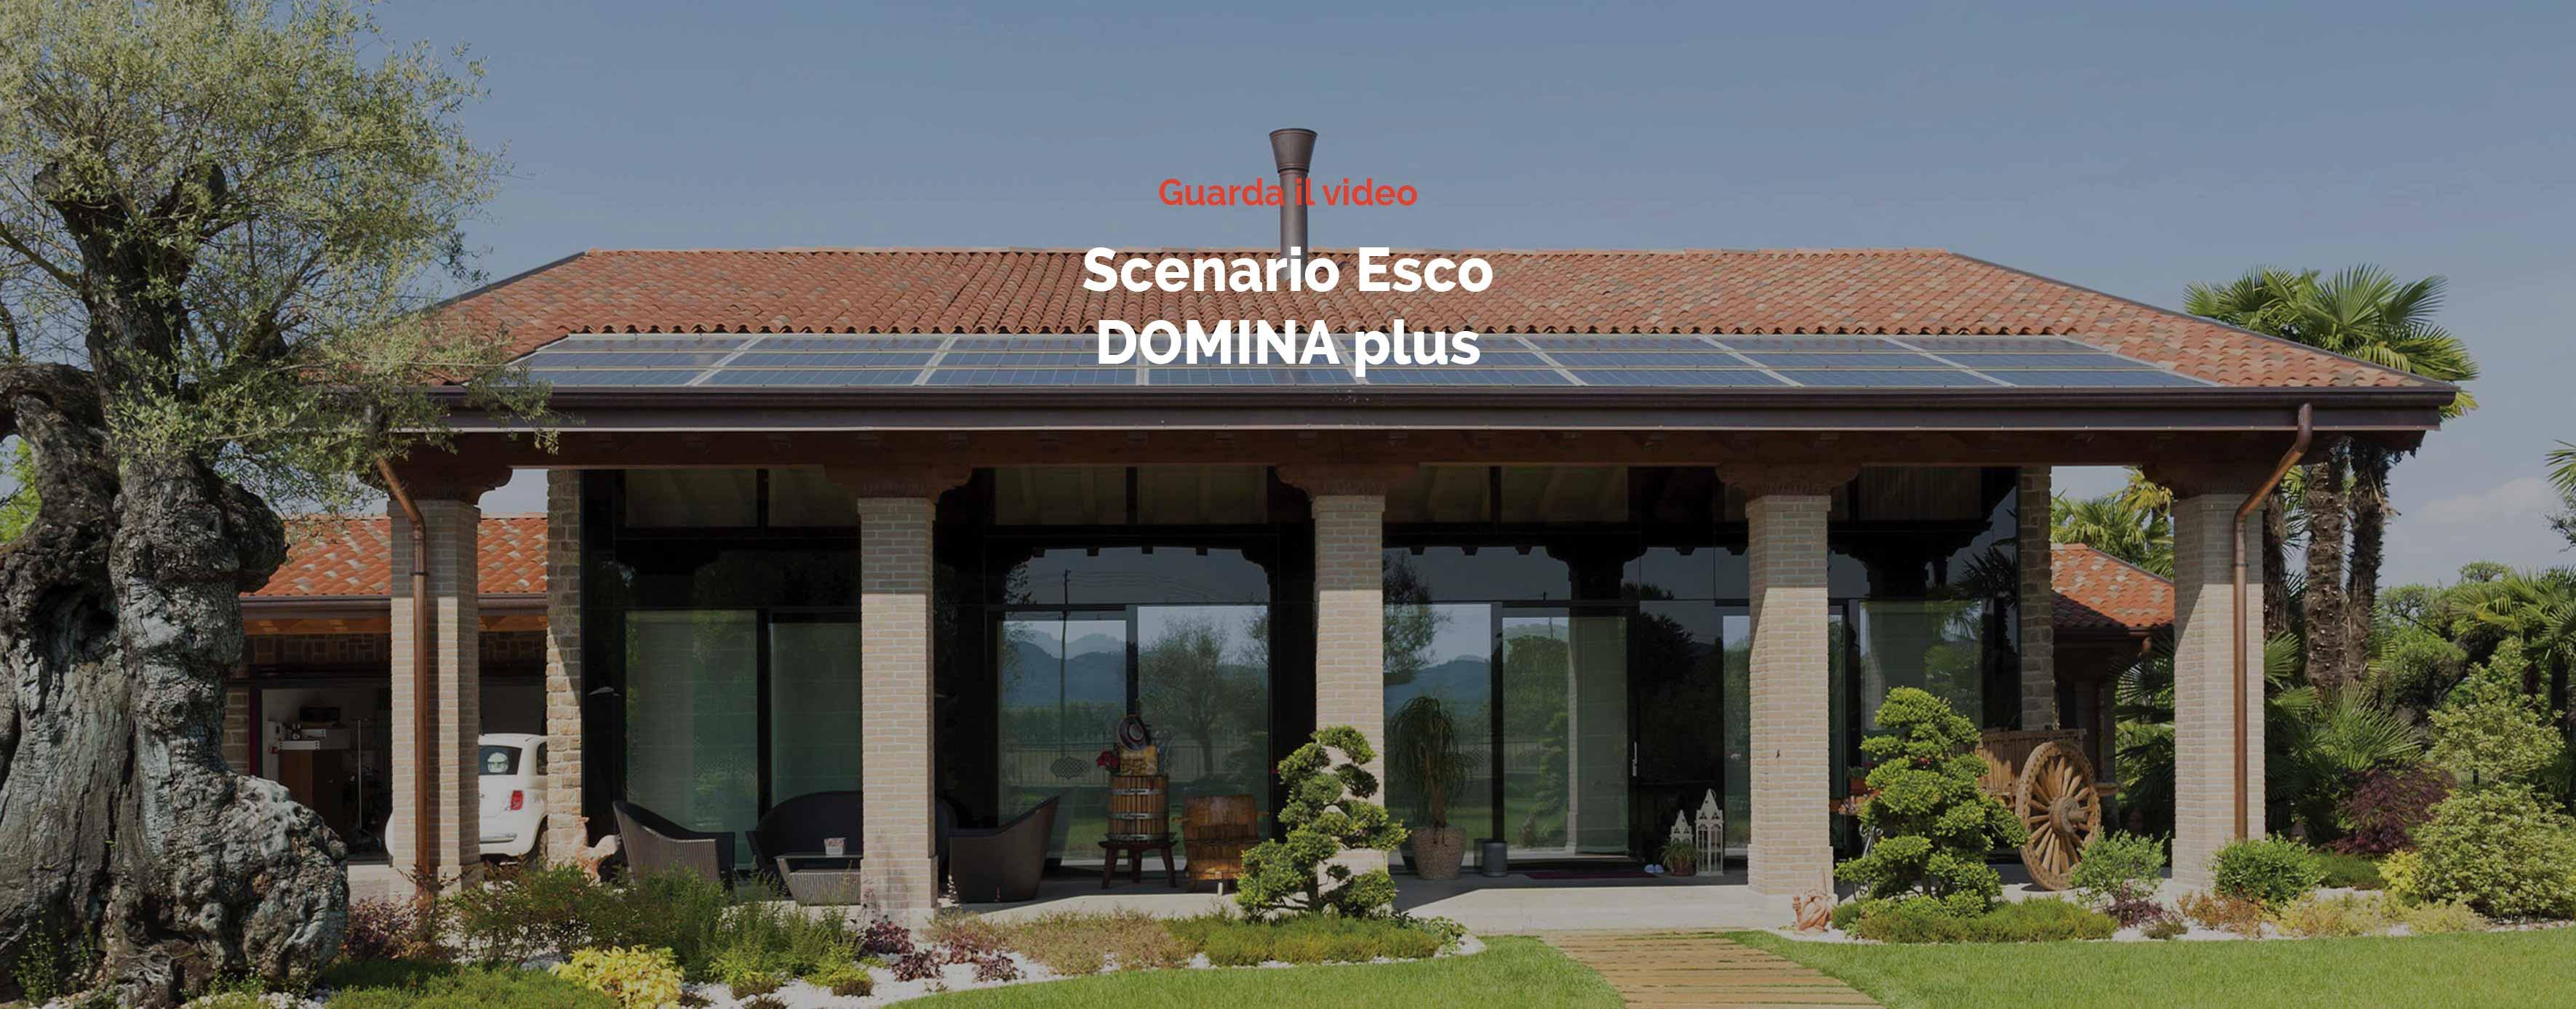 Video Domotica - Scenario domotico - Uscita Ave Domina Plus